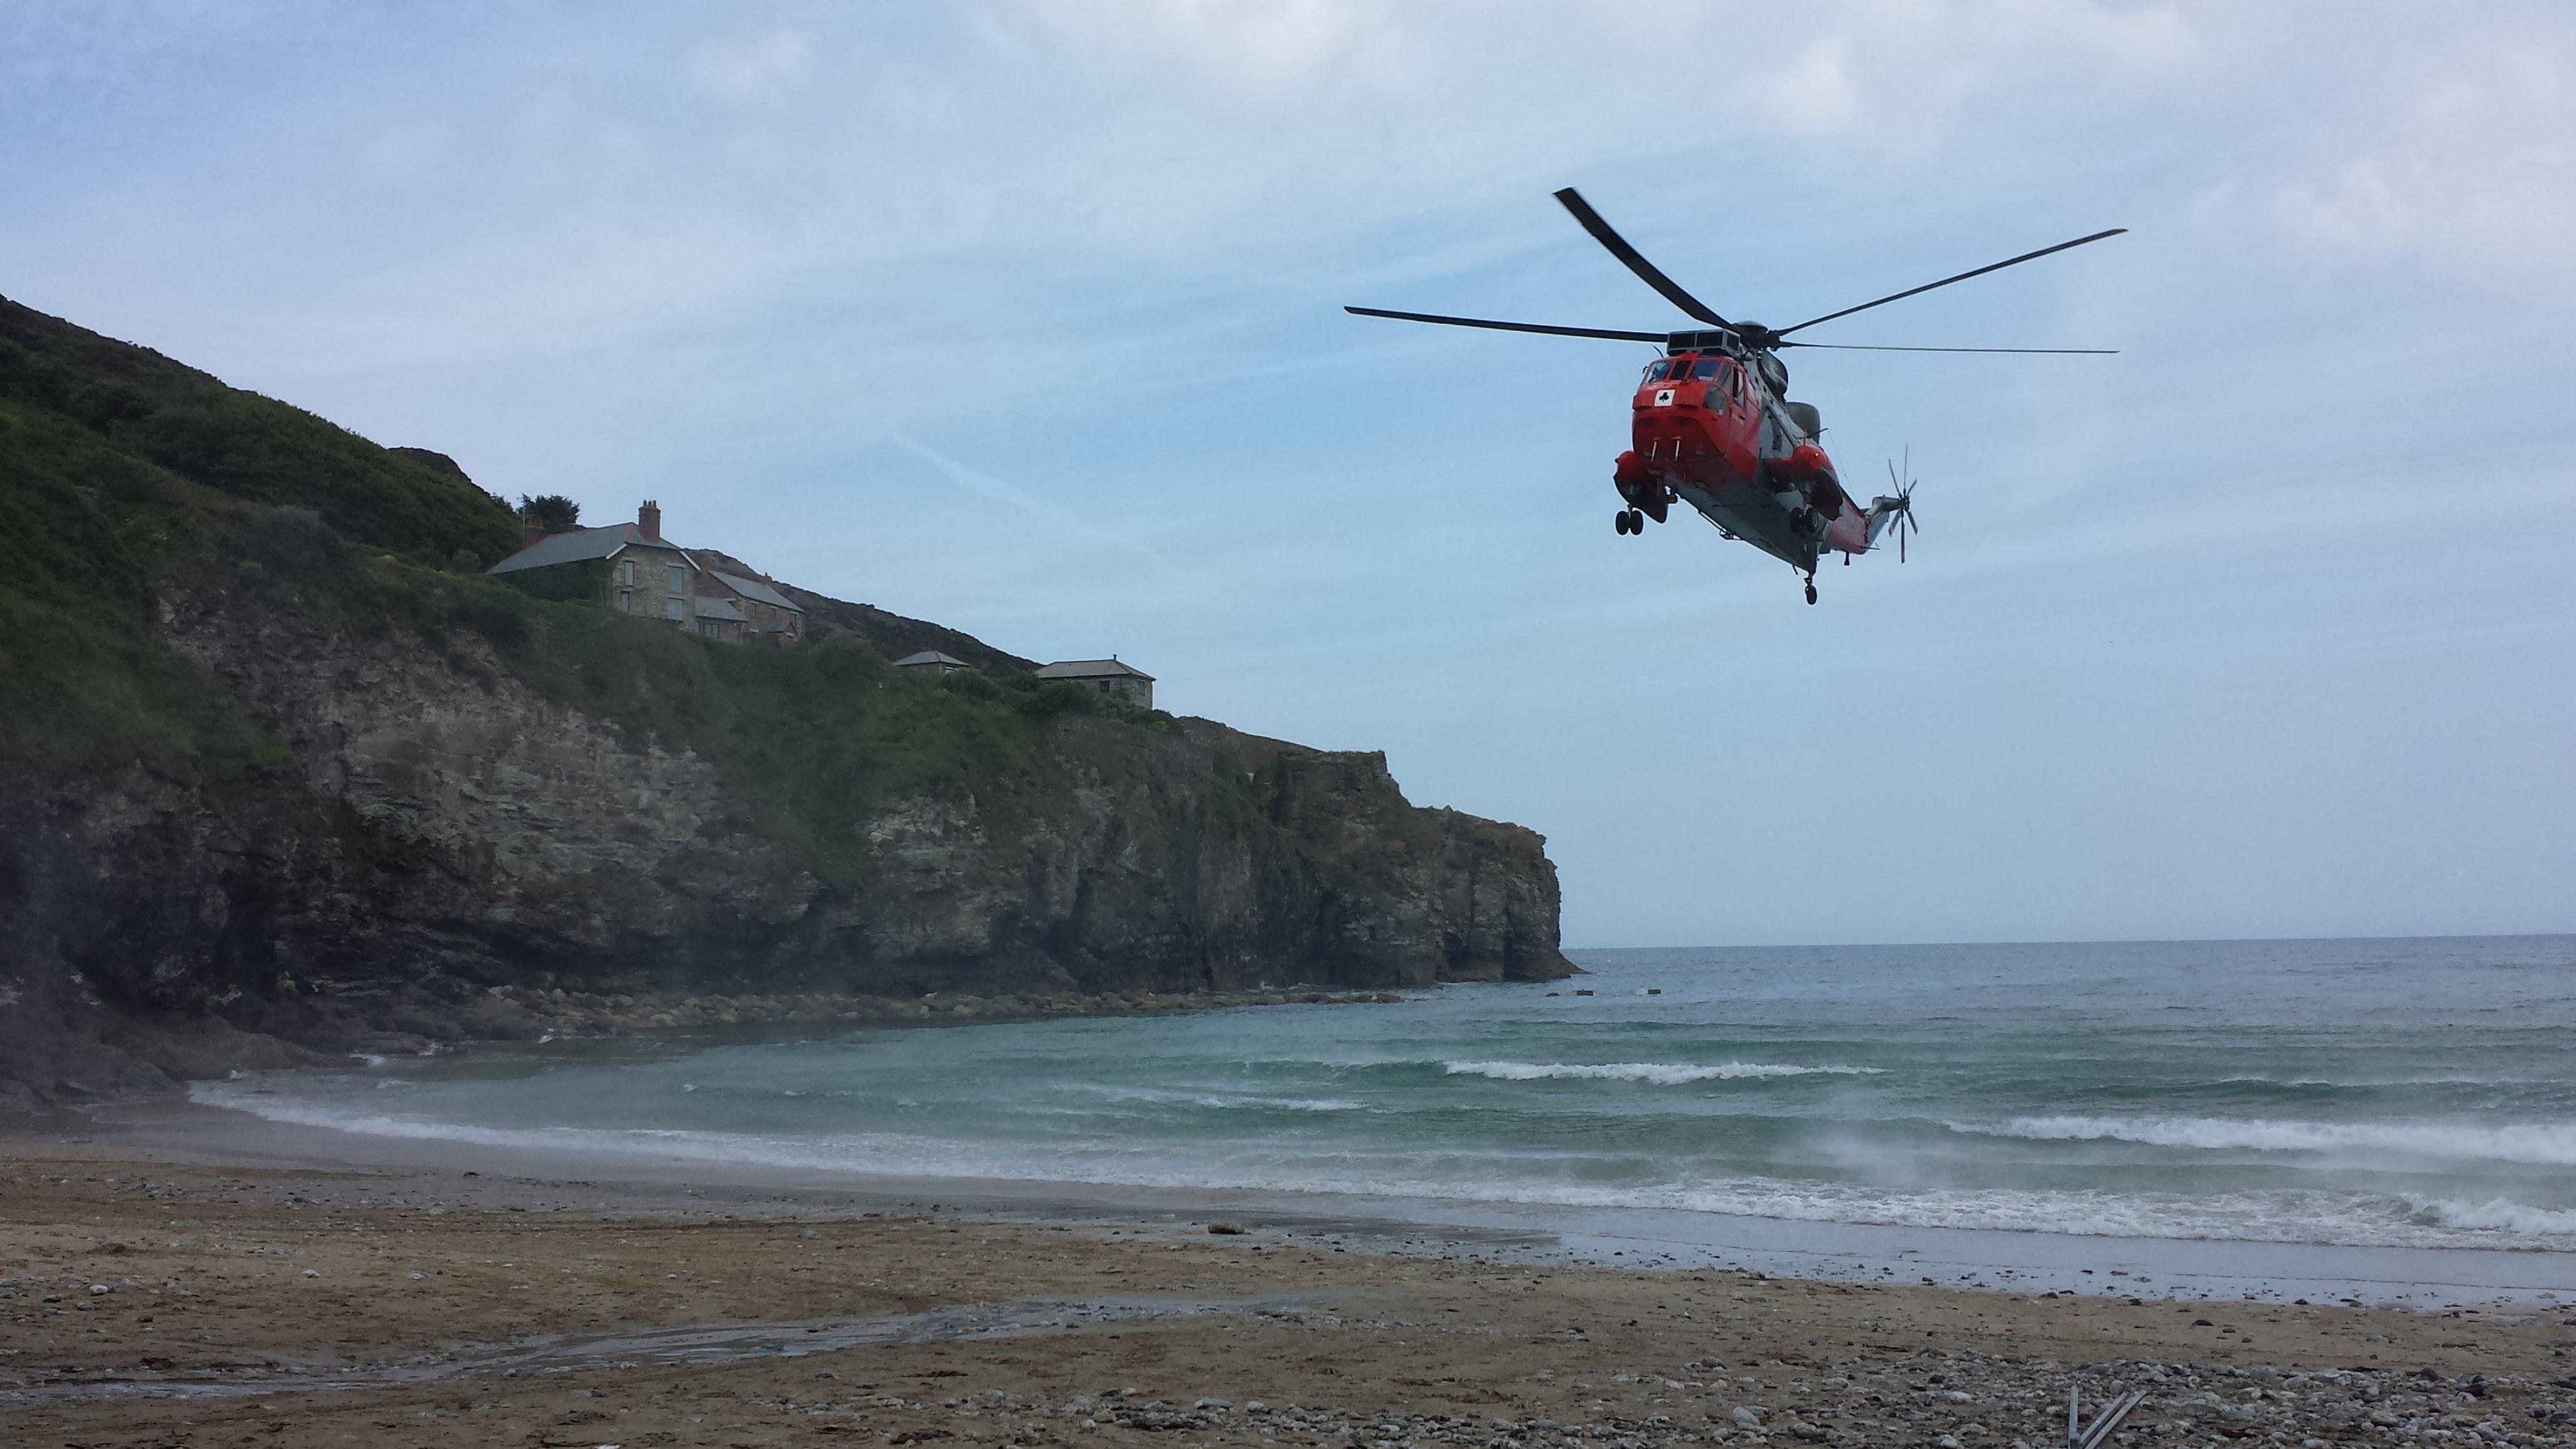 HM Coastguard training at Trevaunance Cove, St Agnes